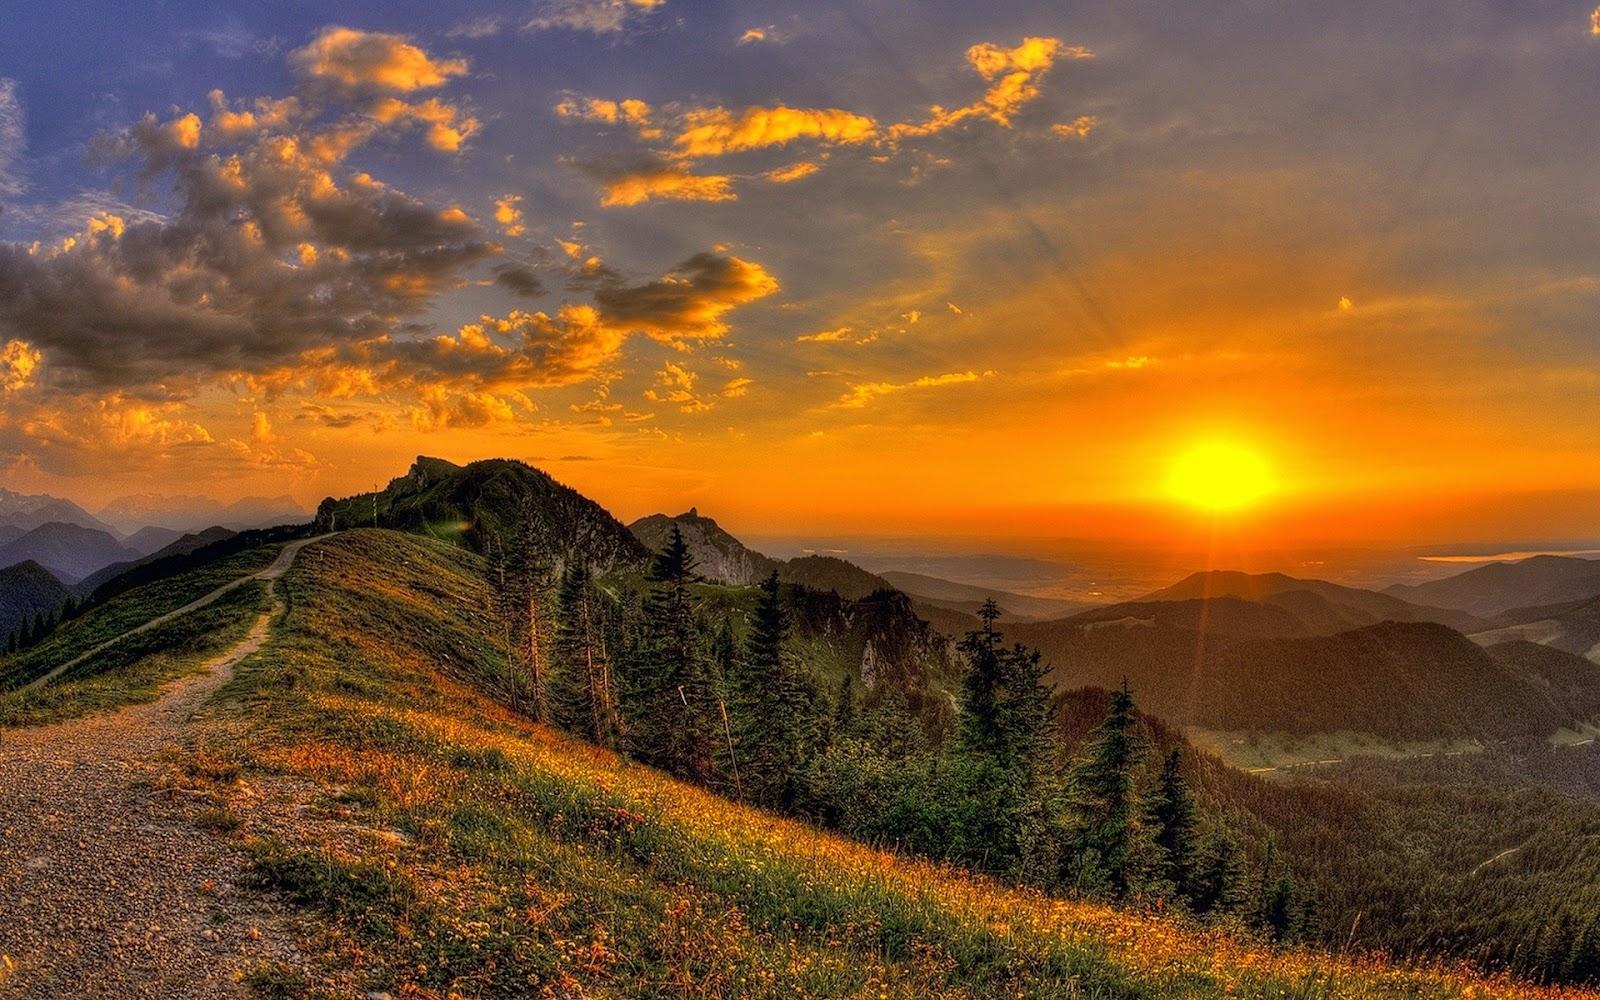 100% Desktop Quality HD Wallpapers 1080p Free Download: Top 28 Nature Wallpapers HD Free Download